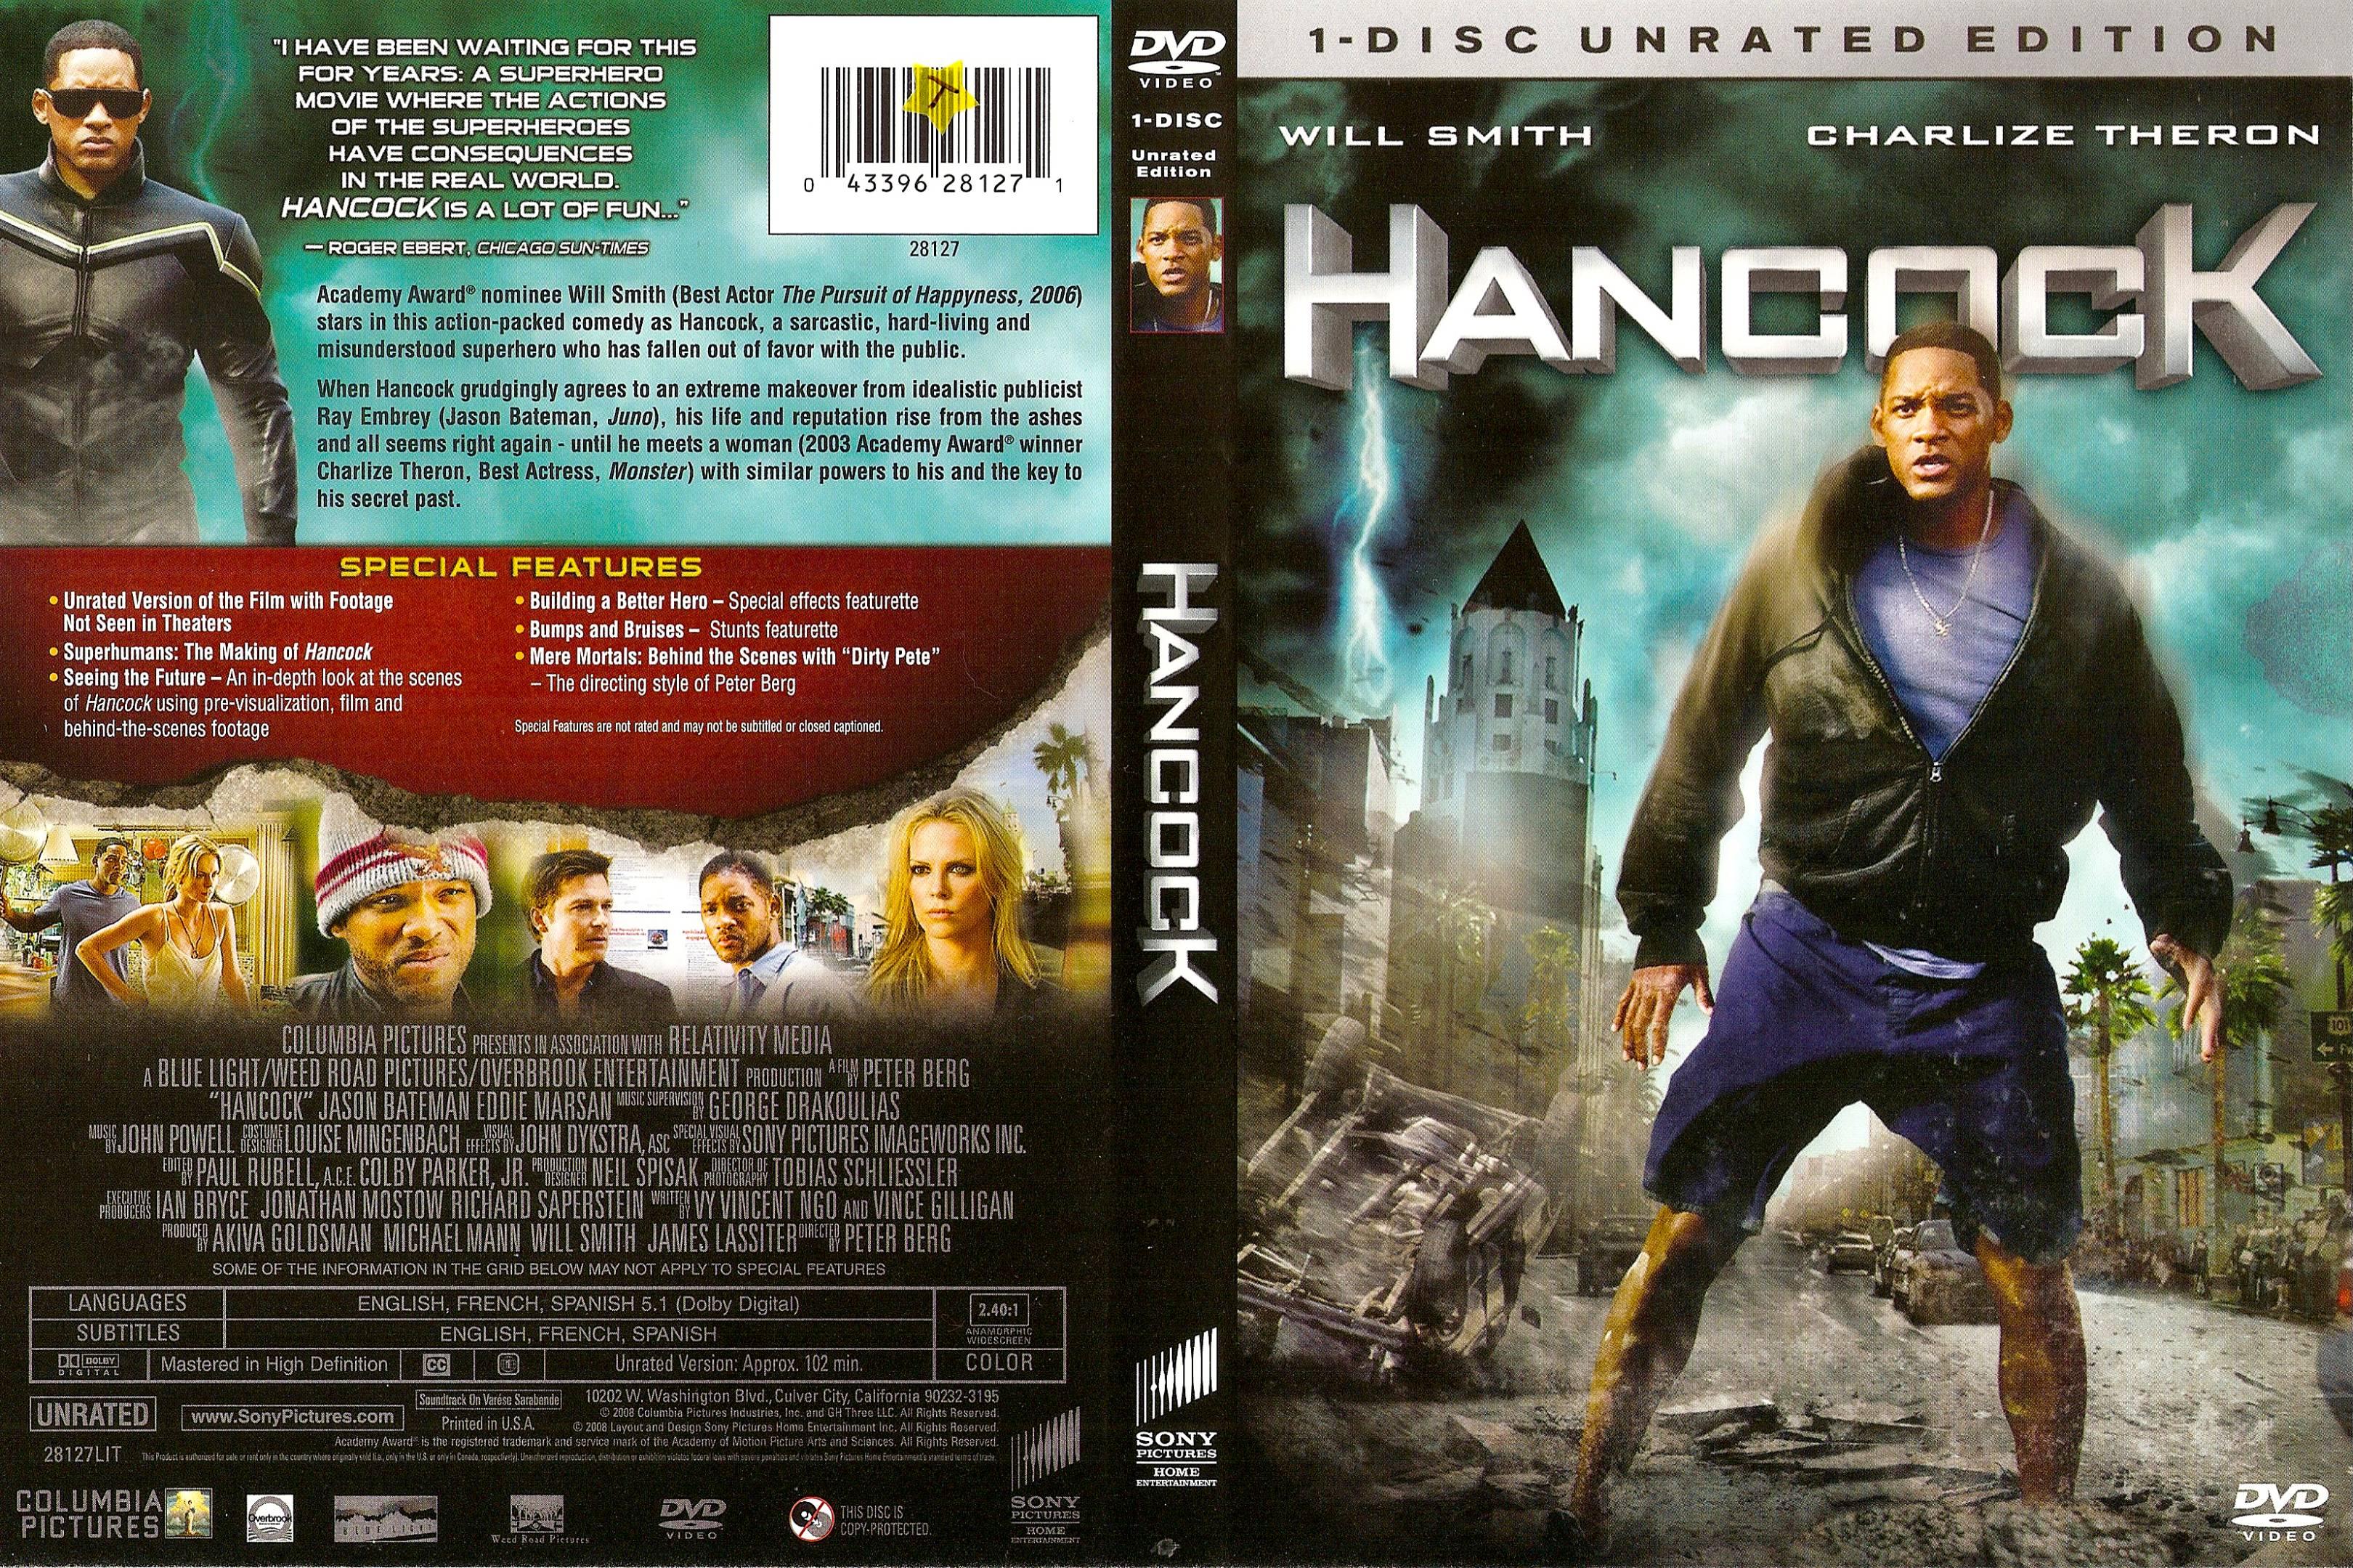 hancock 1080p